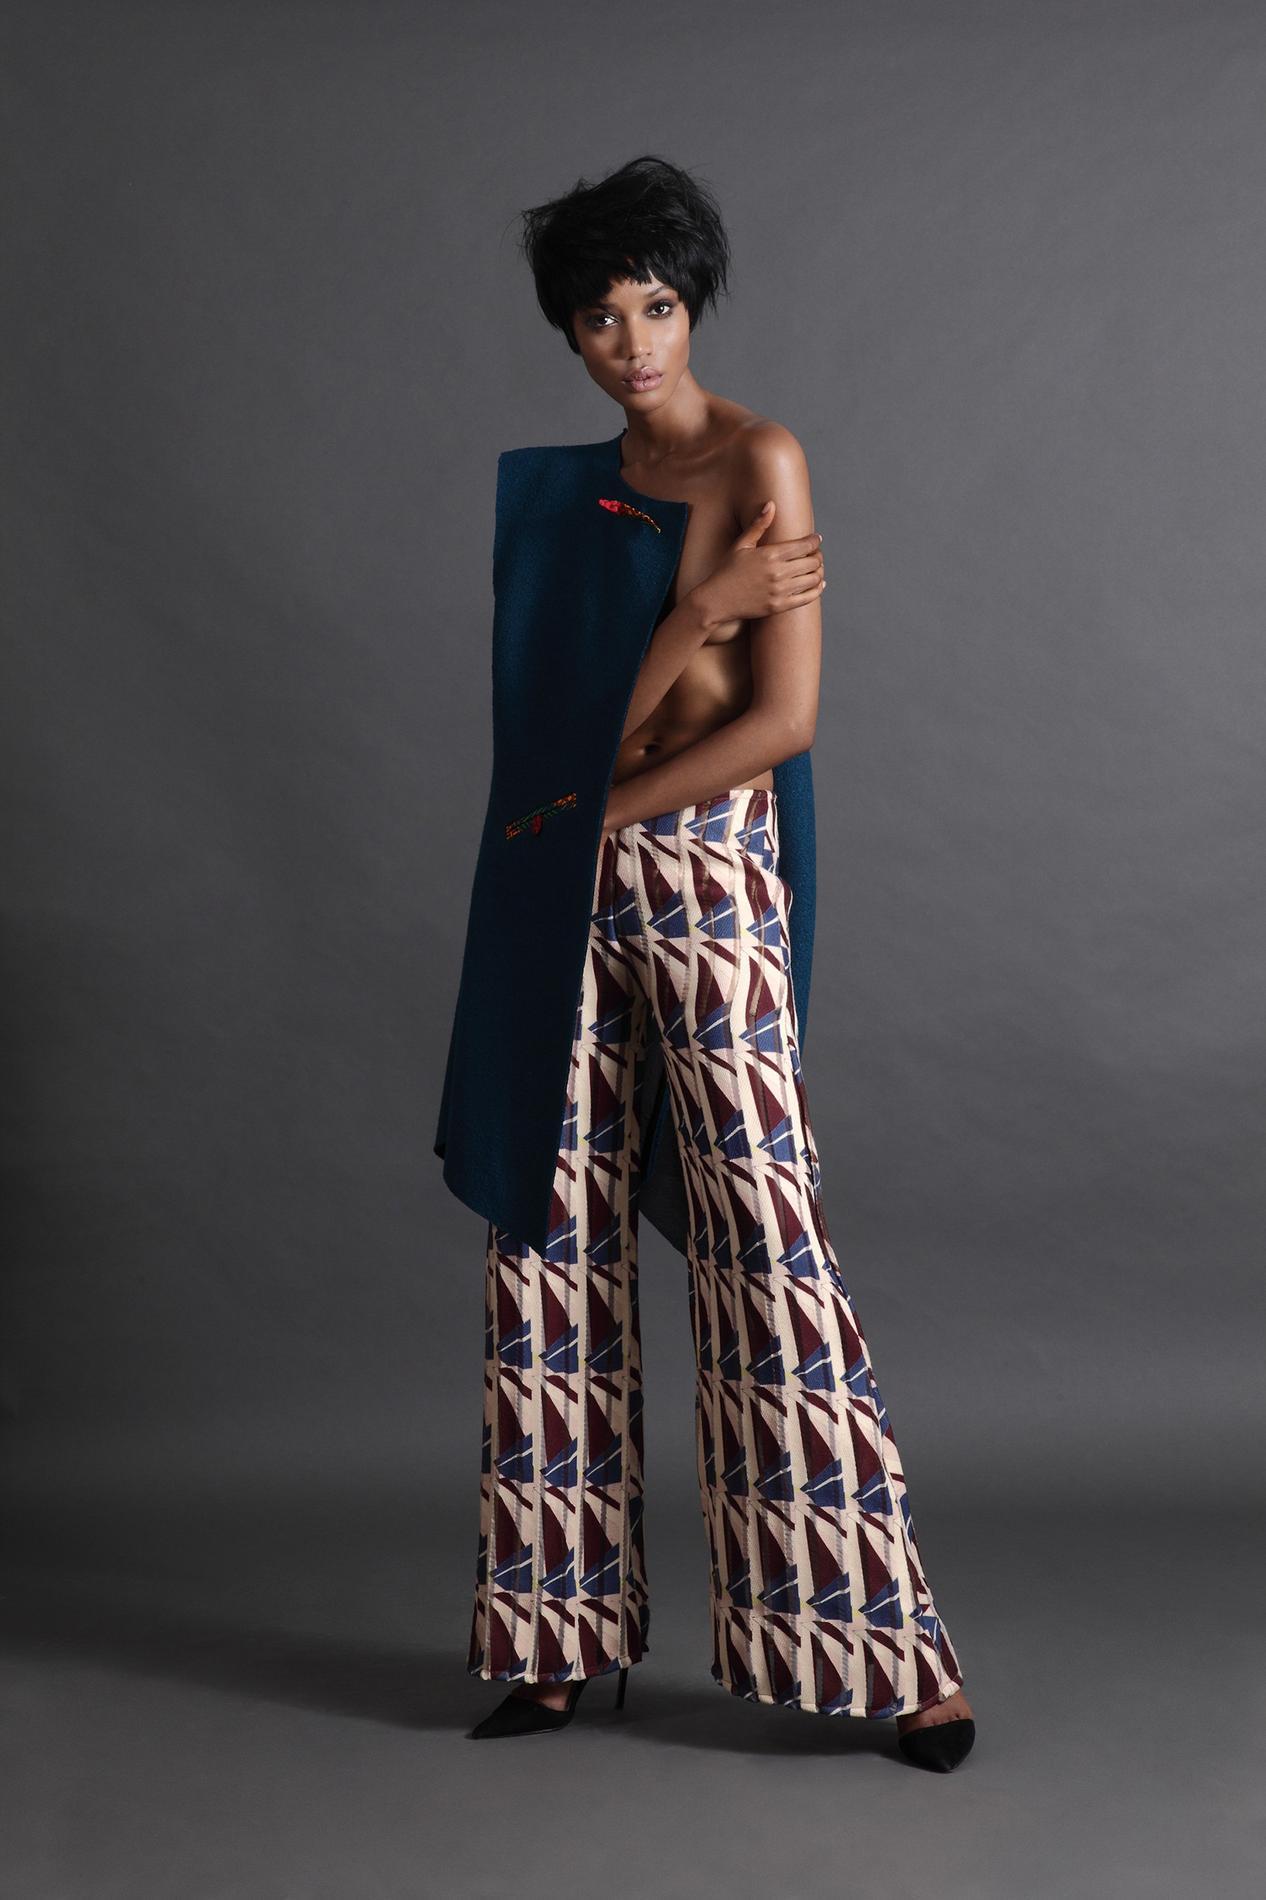 Les Jeunes Createurs Qui Font Briller La Mode Africaine Madame Figaro